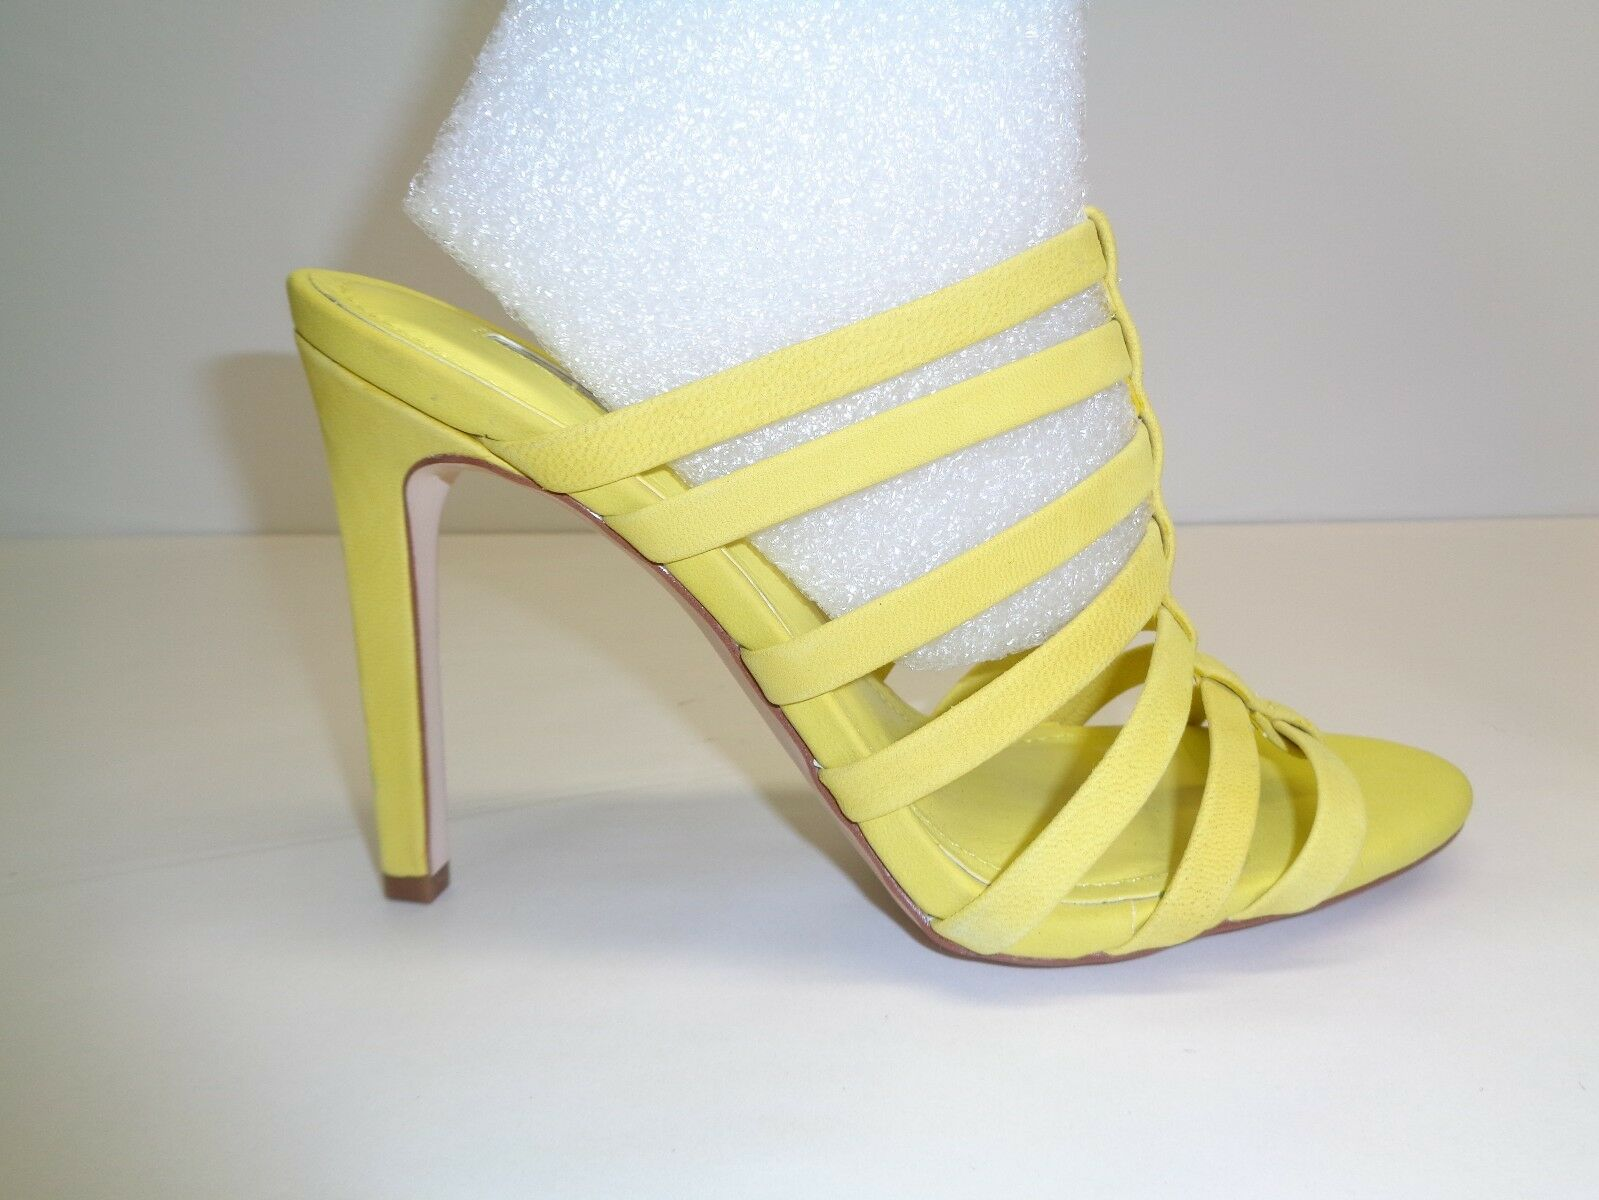 Bcbg Bcbgeneration tamaño 6 M Callie Nuevos Mujer Zapatos Sandalias De Cuero Amarillo